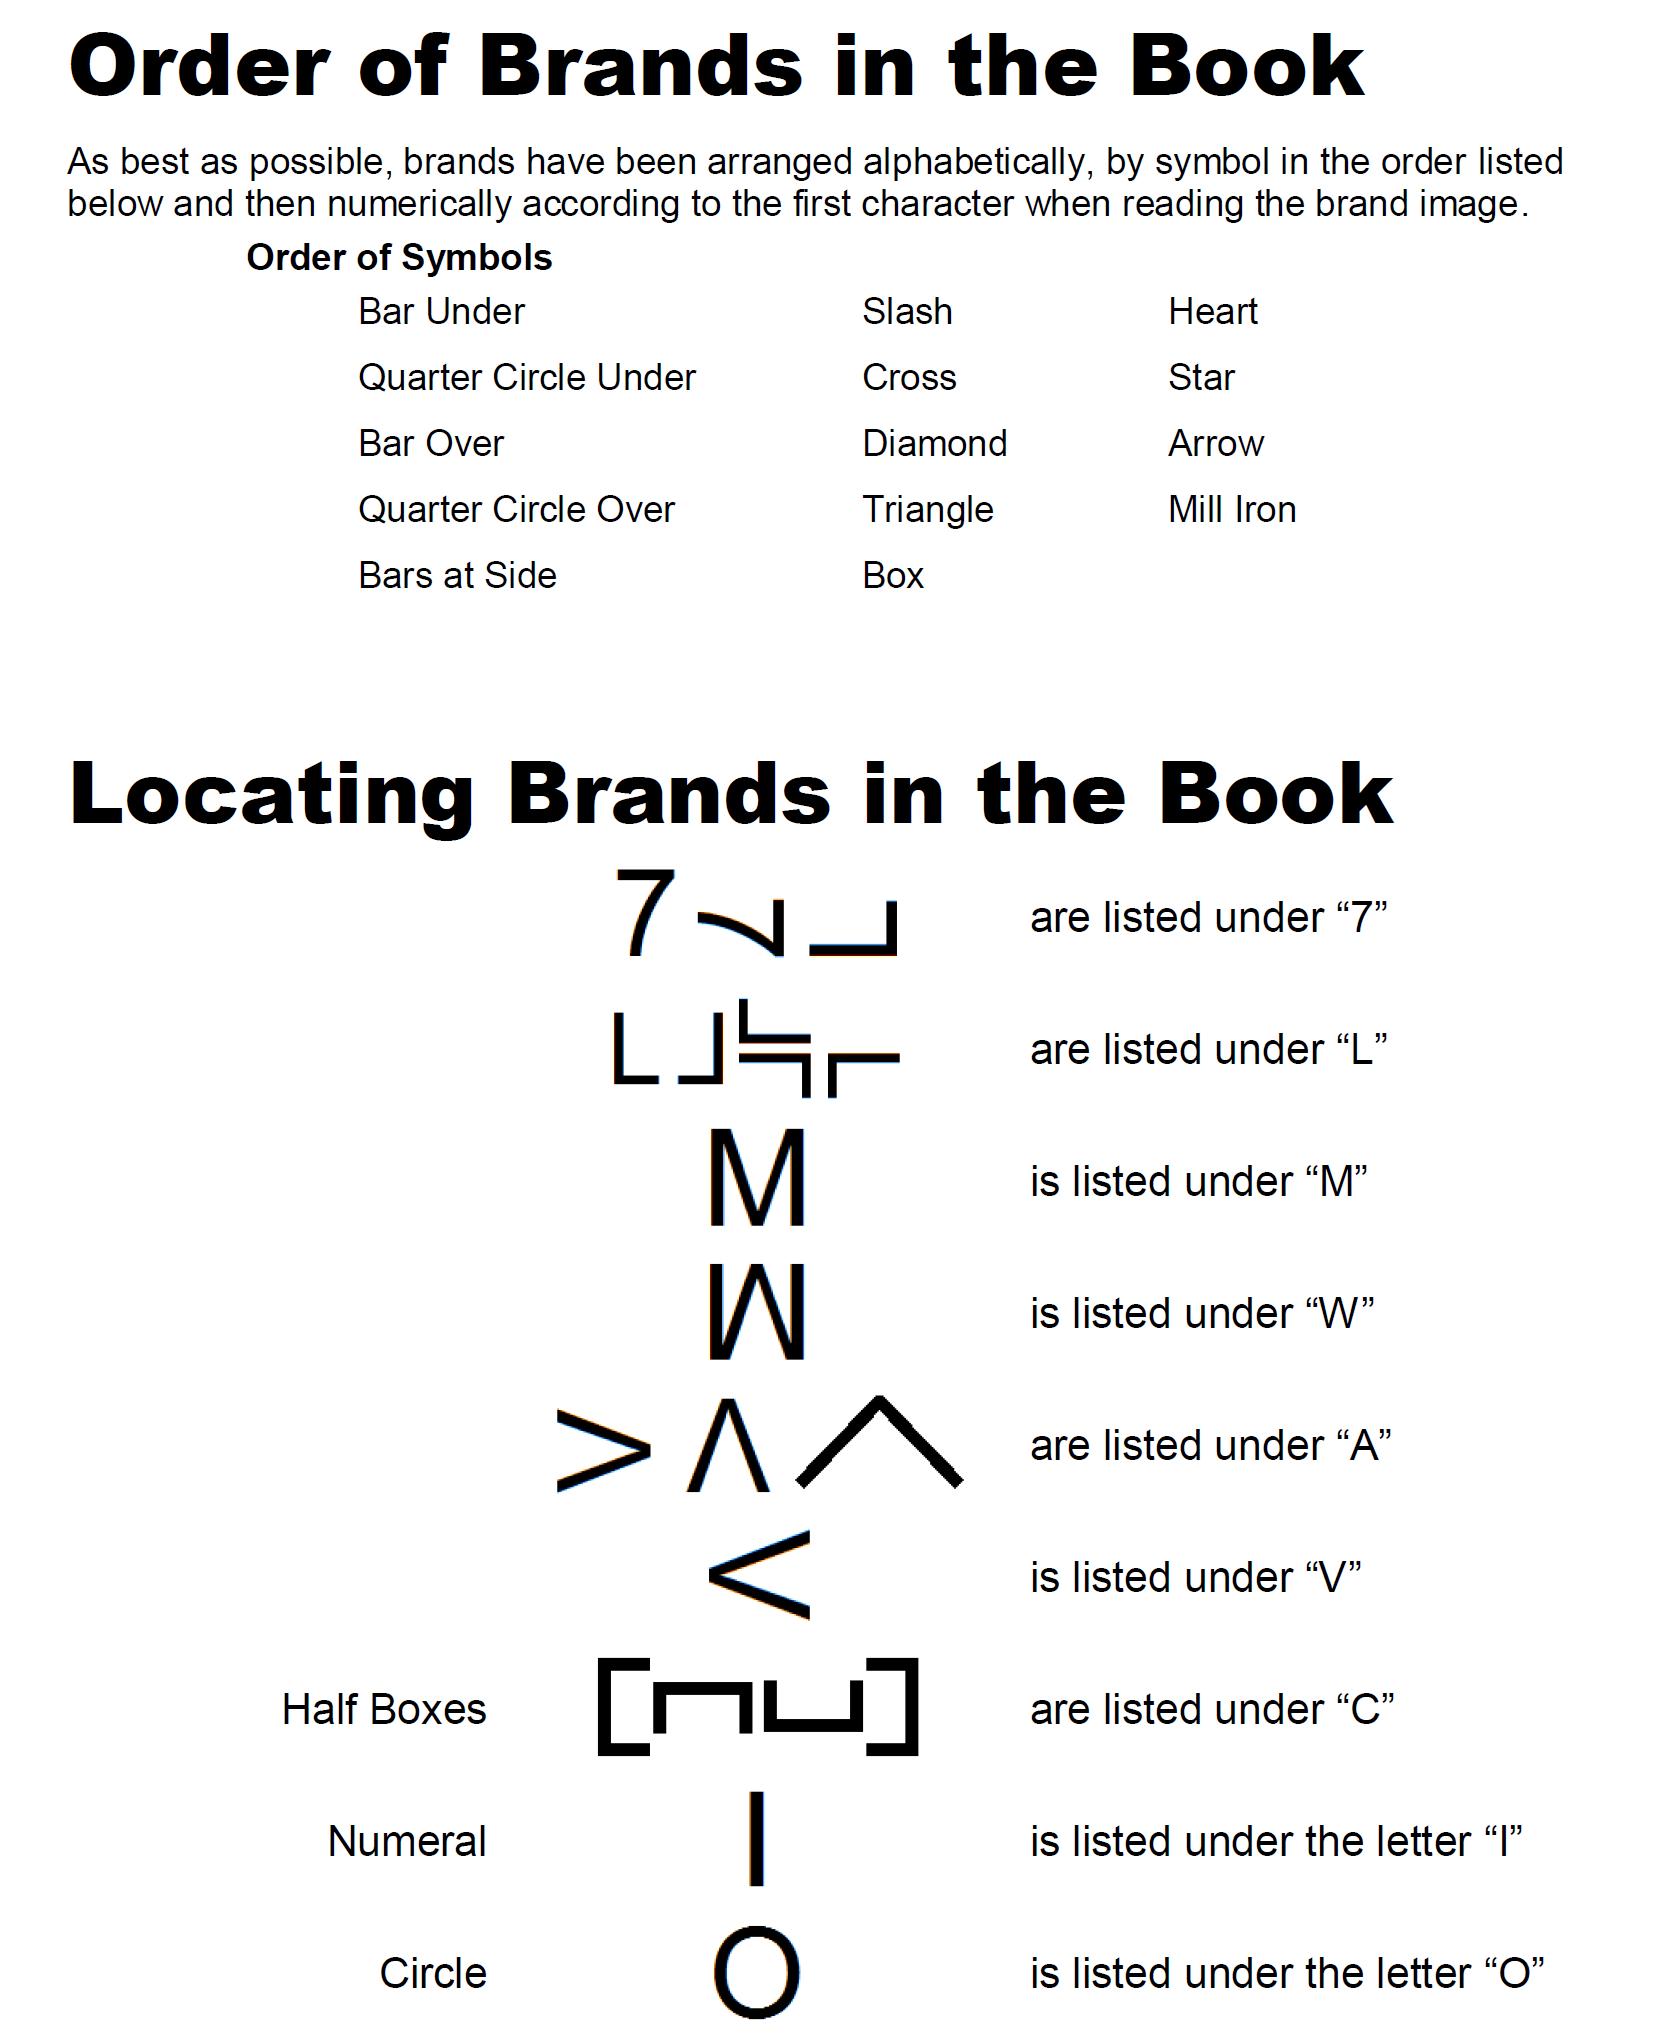 North Dakota Stockmen's Association - 2016 Brand Book